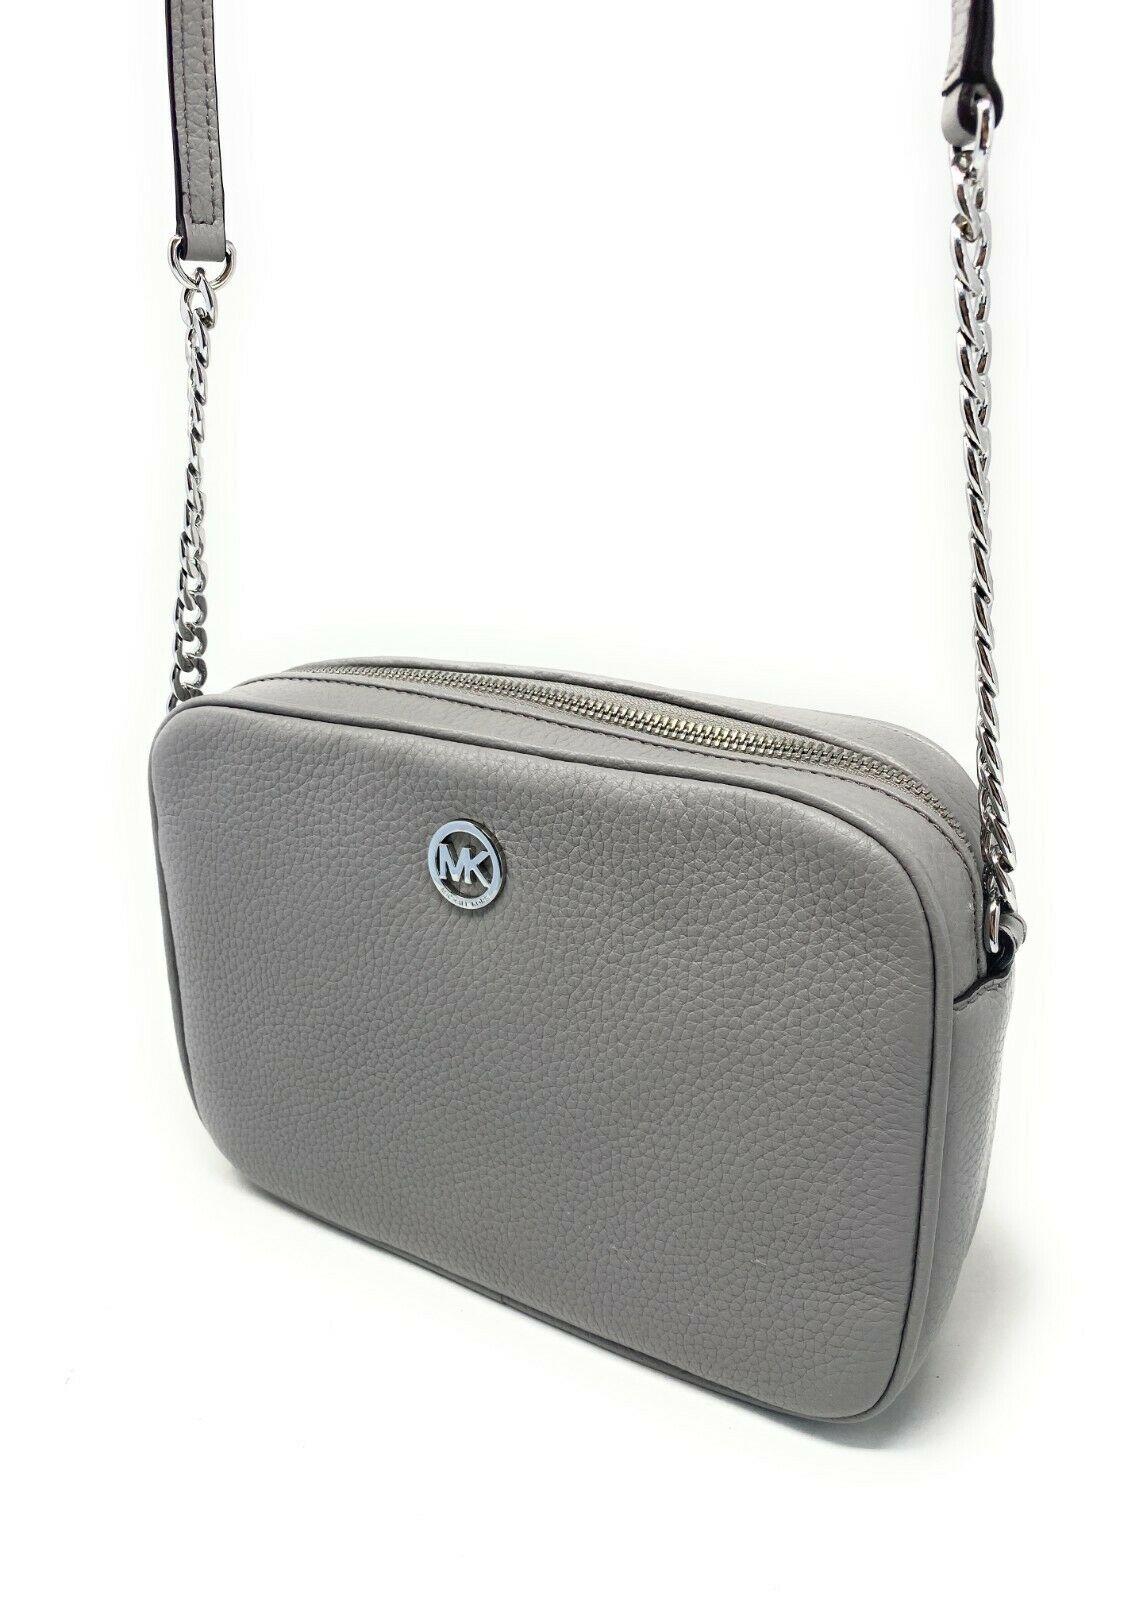 thumbnail 57 - Michael Kors Jet Set Item Large East West Crossbody Chain Handbag Clutch $298